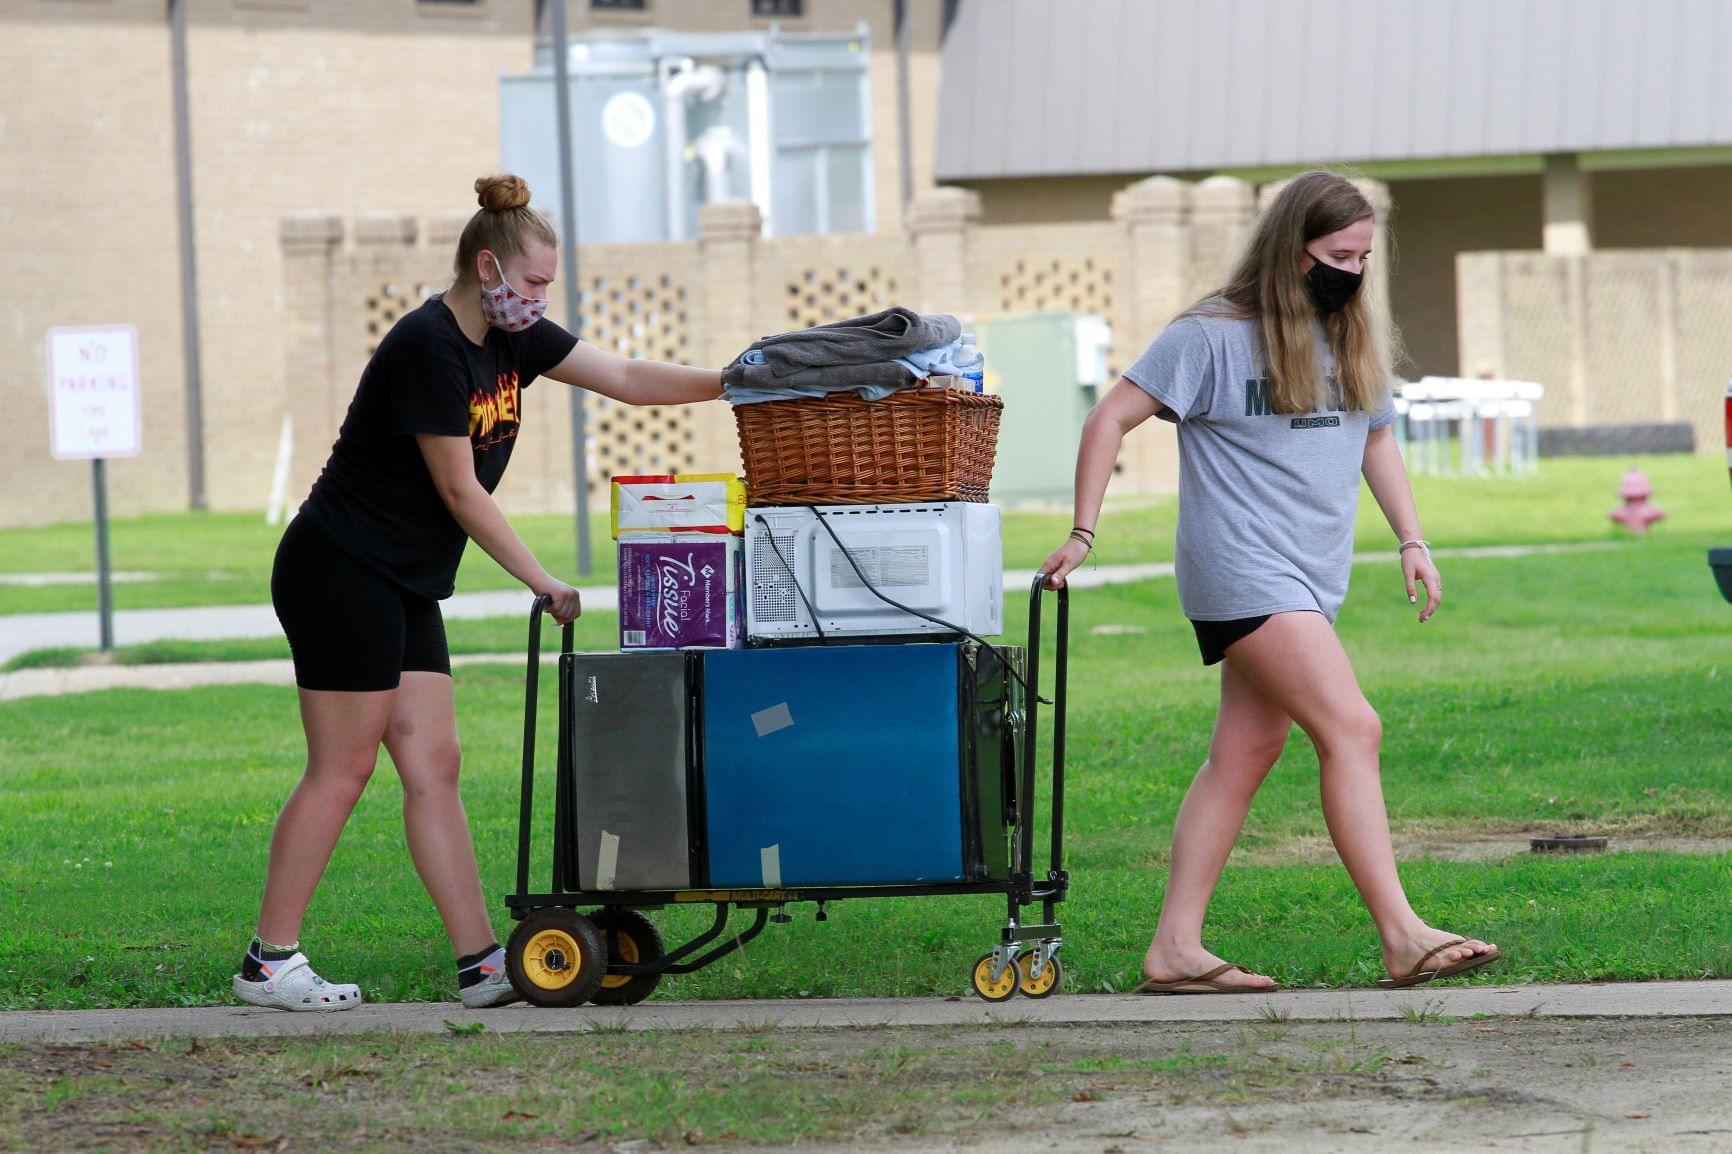 Students Return To UMO  [PHOTOS]